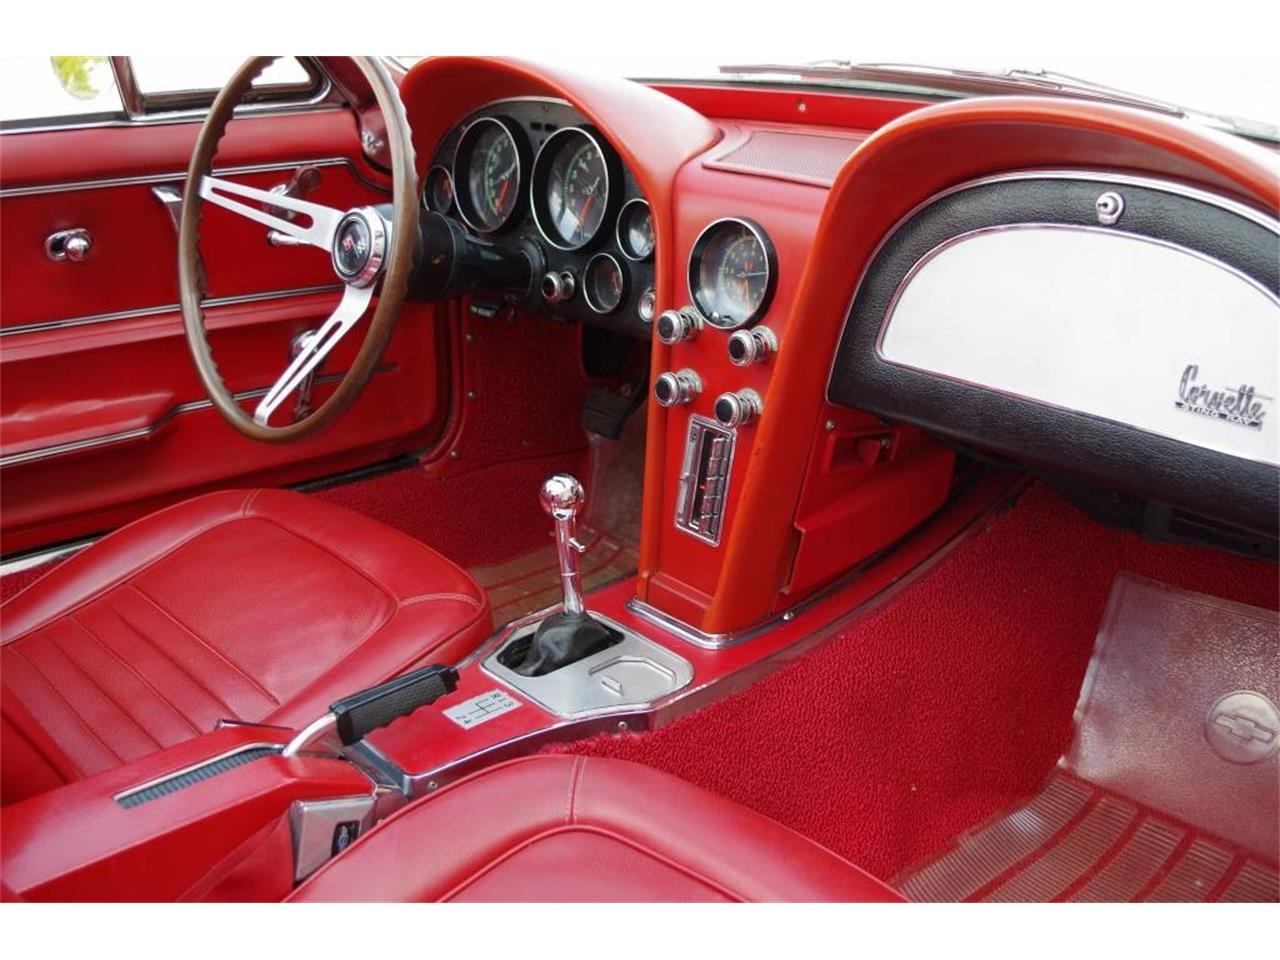 Large Picture of 1967 Corvette located in Missouri - $129,995.00 - PZ9R